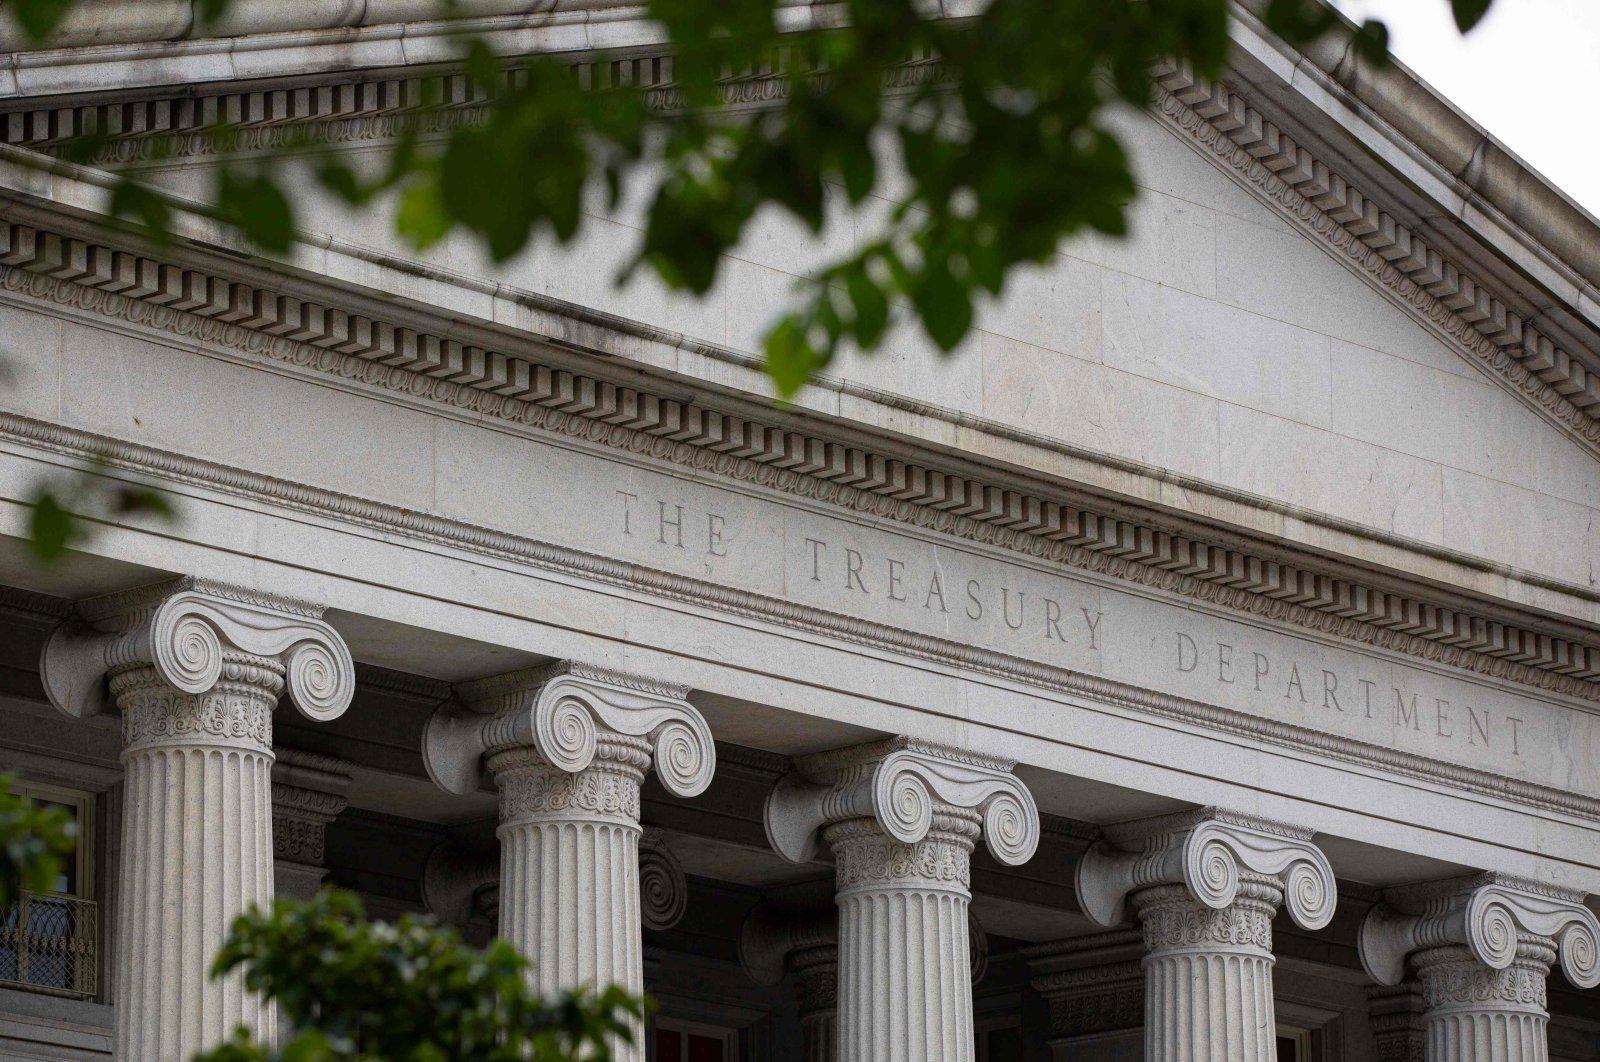 The U.S. Treasury Department building is seen in Washington, D.C., U.S., July 22, 2019. (AFP Photo)